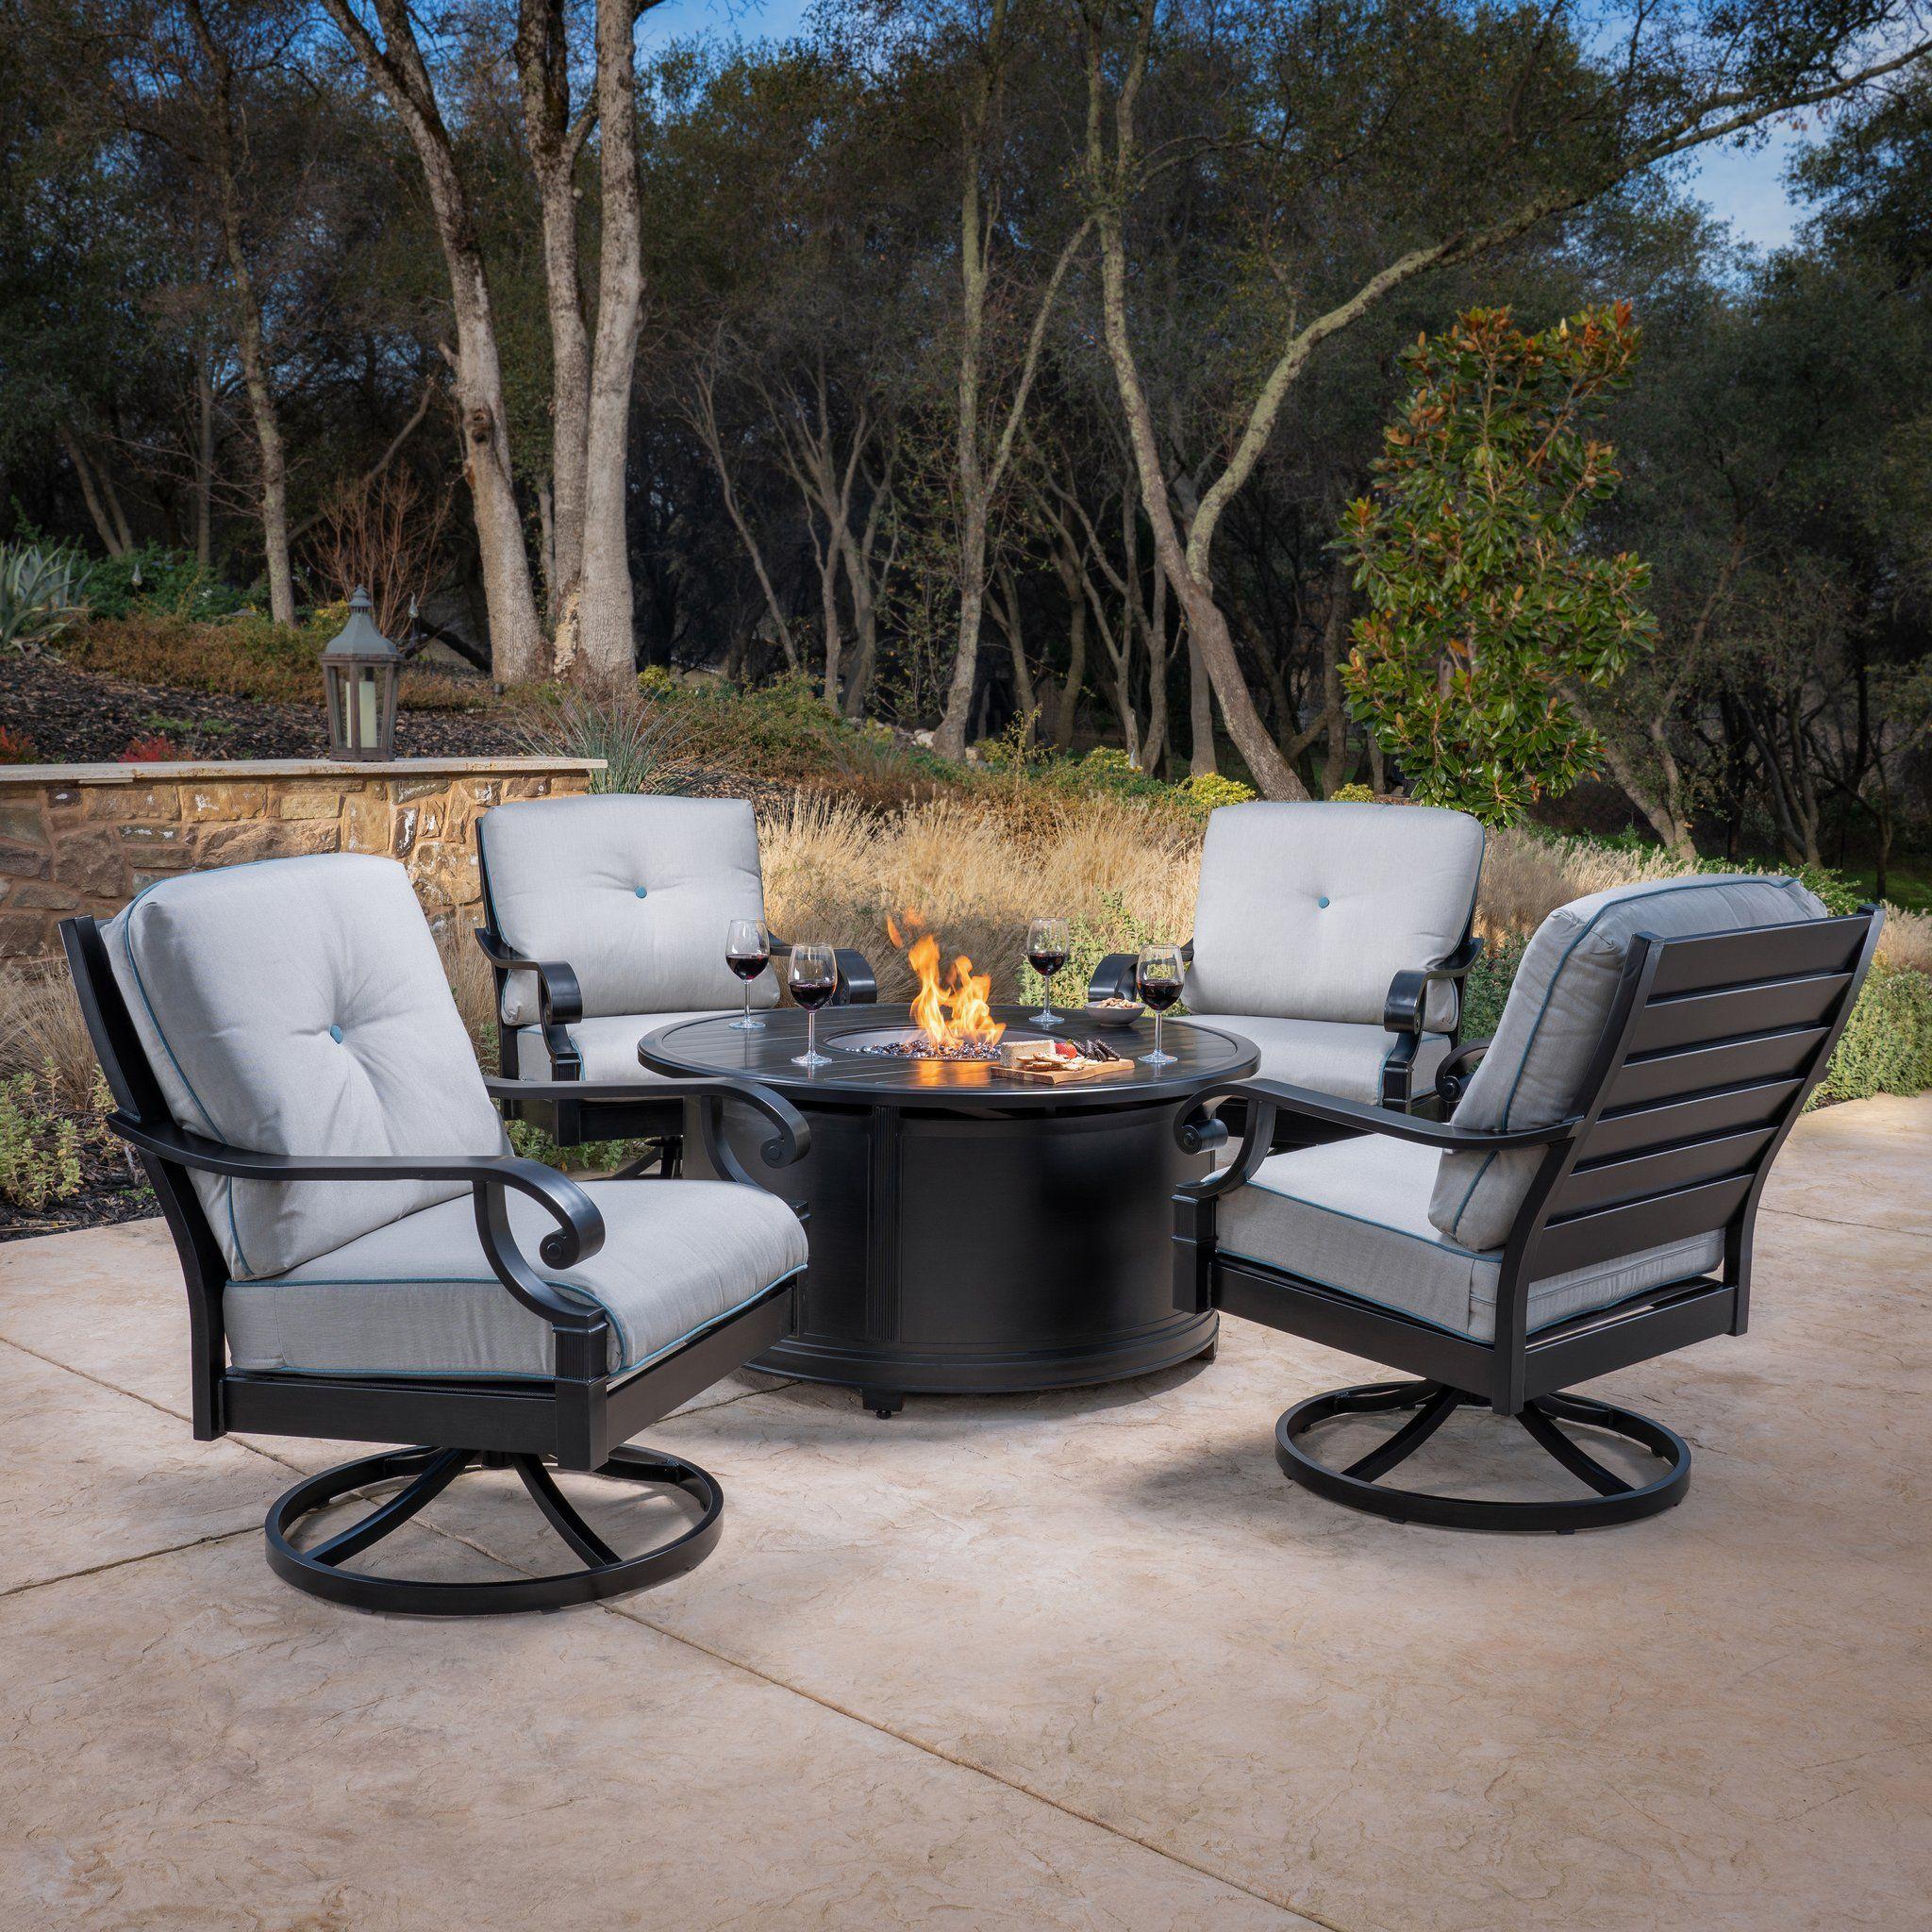 Verena 2 Piece Swivel Rocker Lounge Chairs Fire Pit Chat Set Patio Teak Outdoor